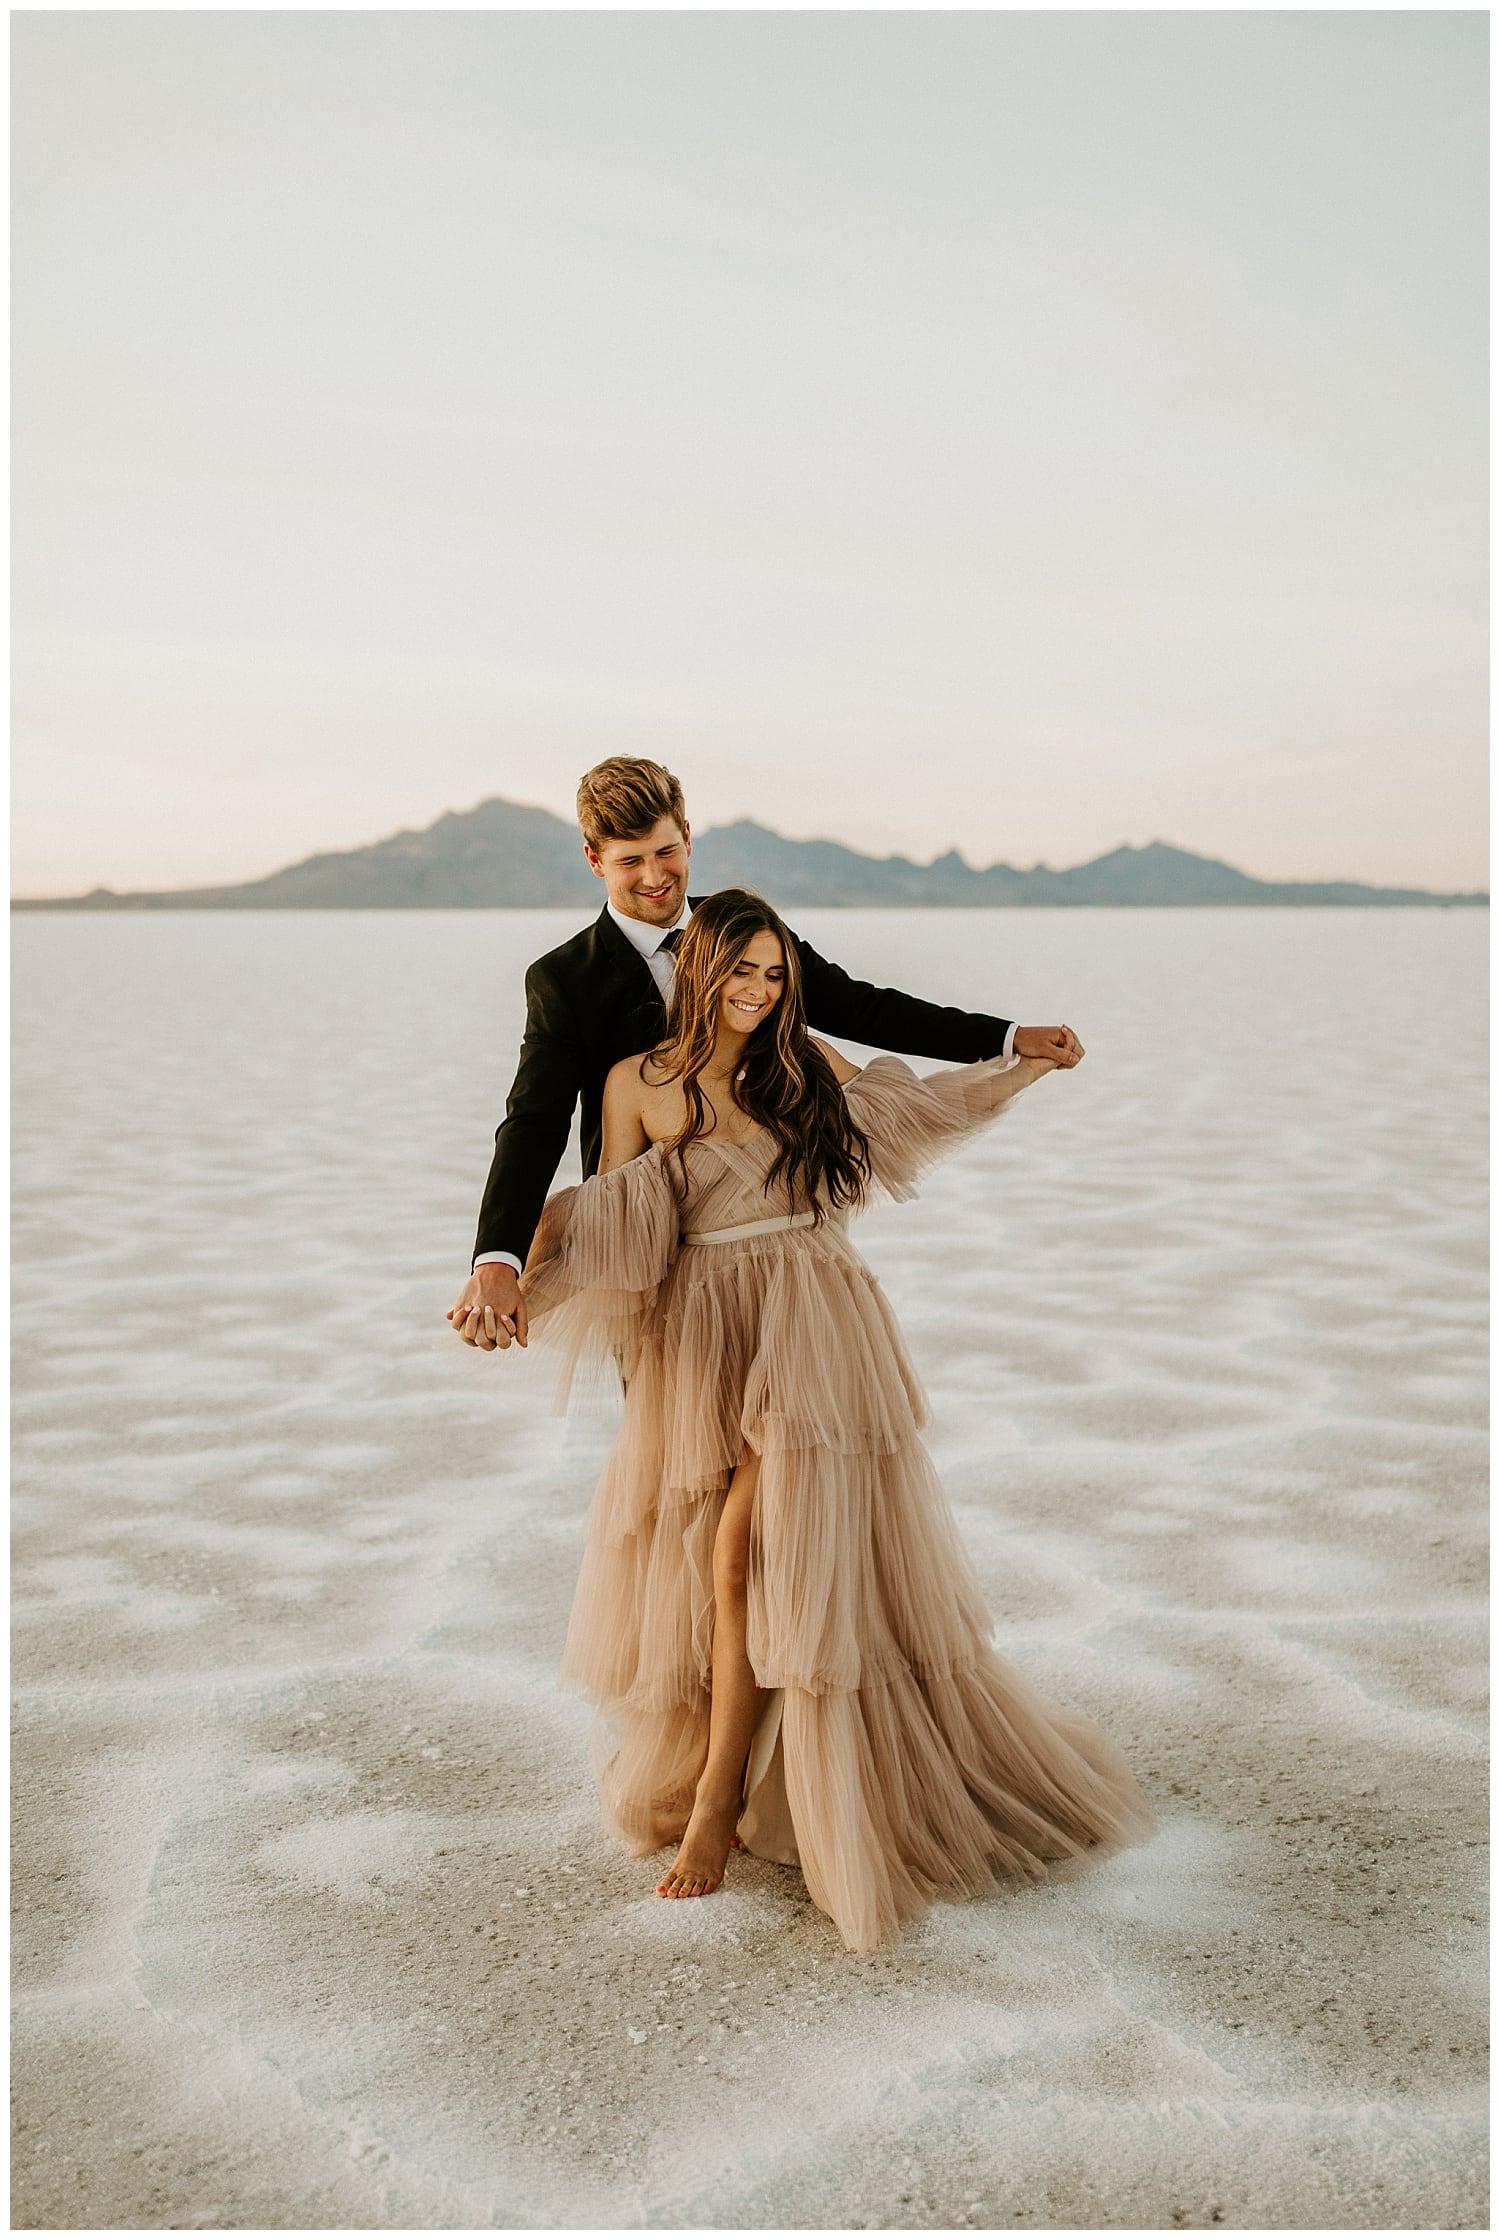 blush wedding dress, bonneville salt flats elopement, photographers in salt lake city, utah wedding photographers